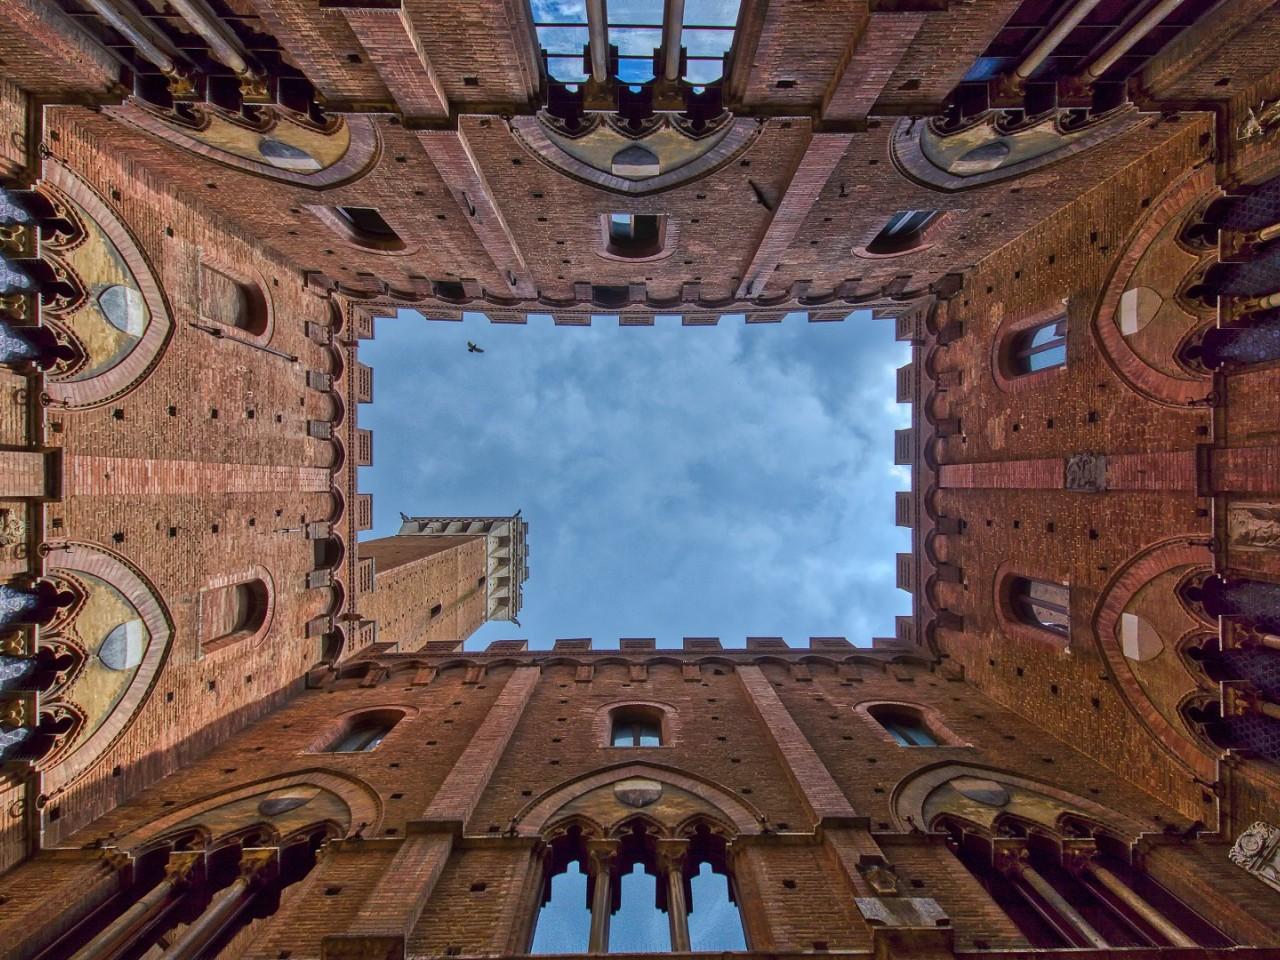 Ognissanti a Siena